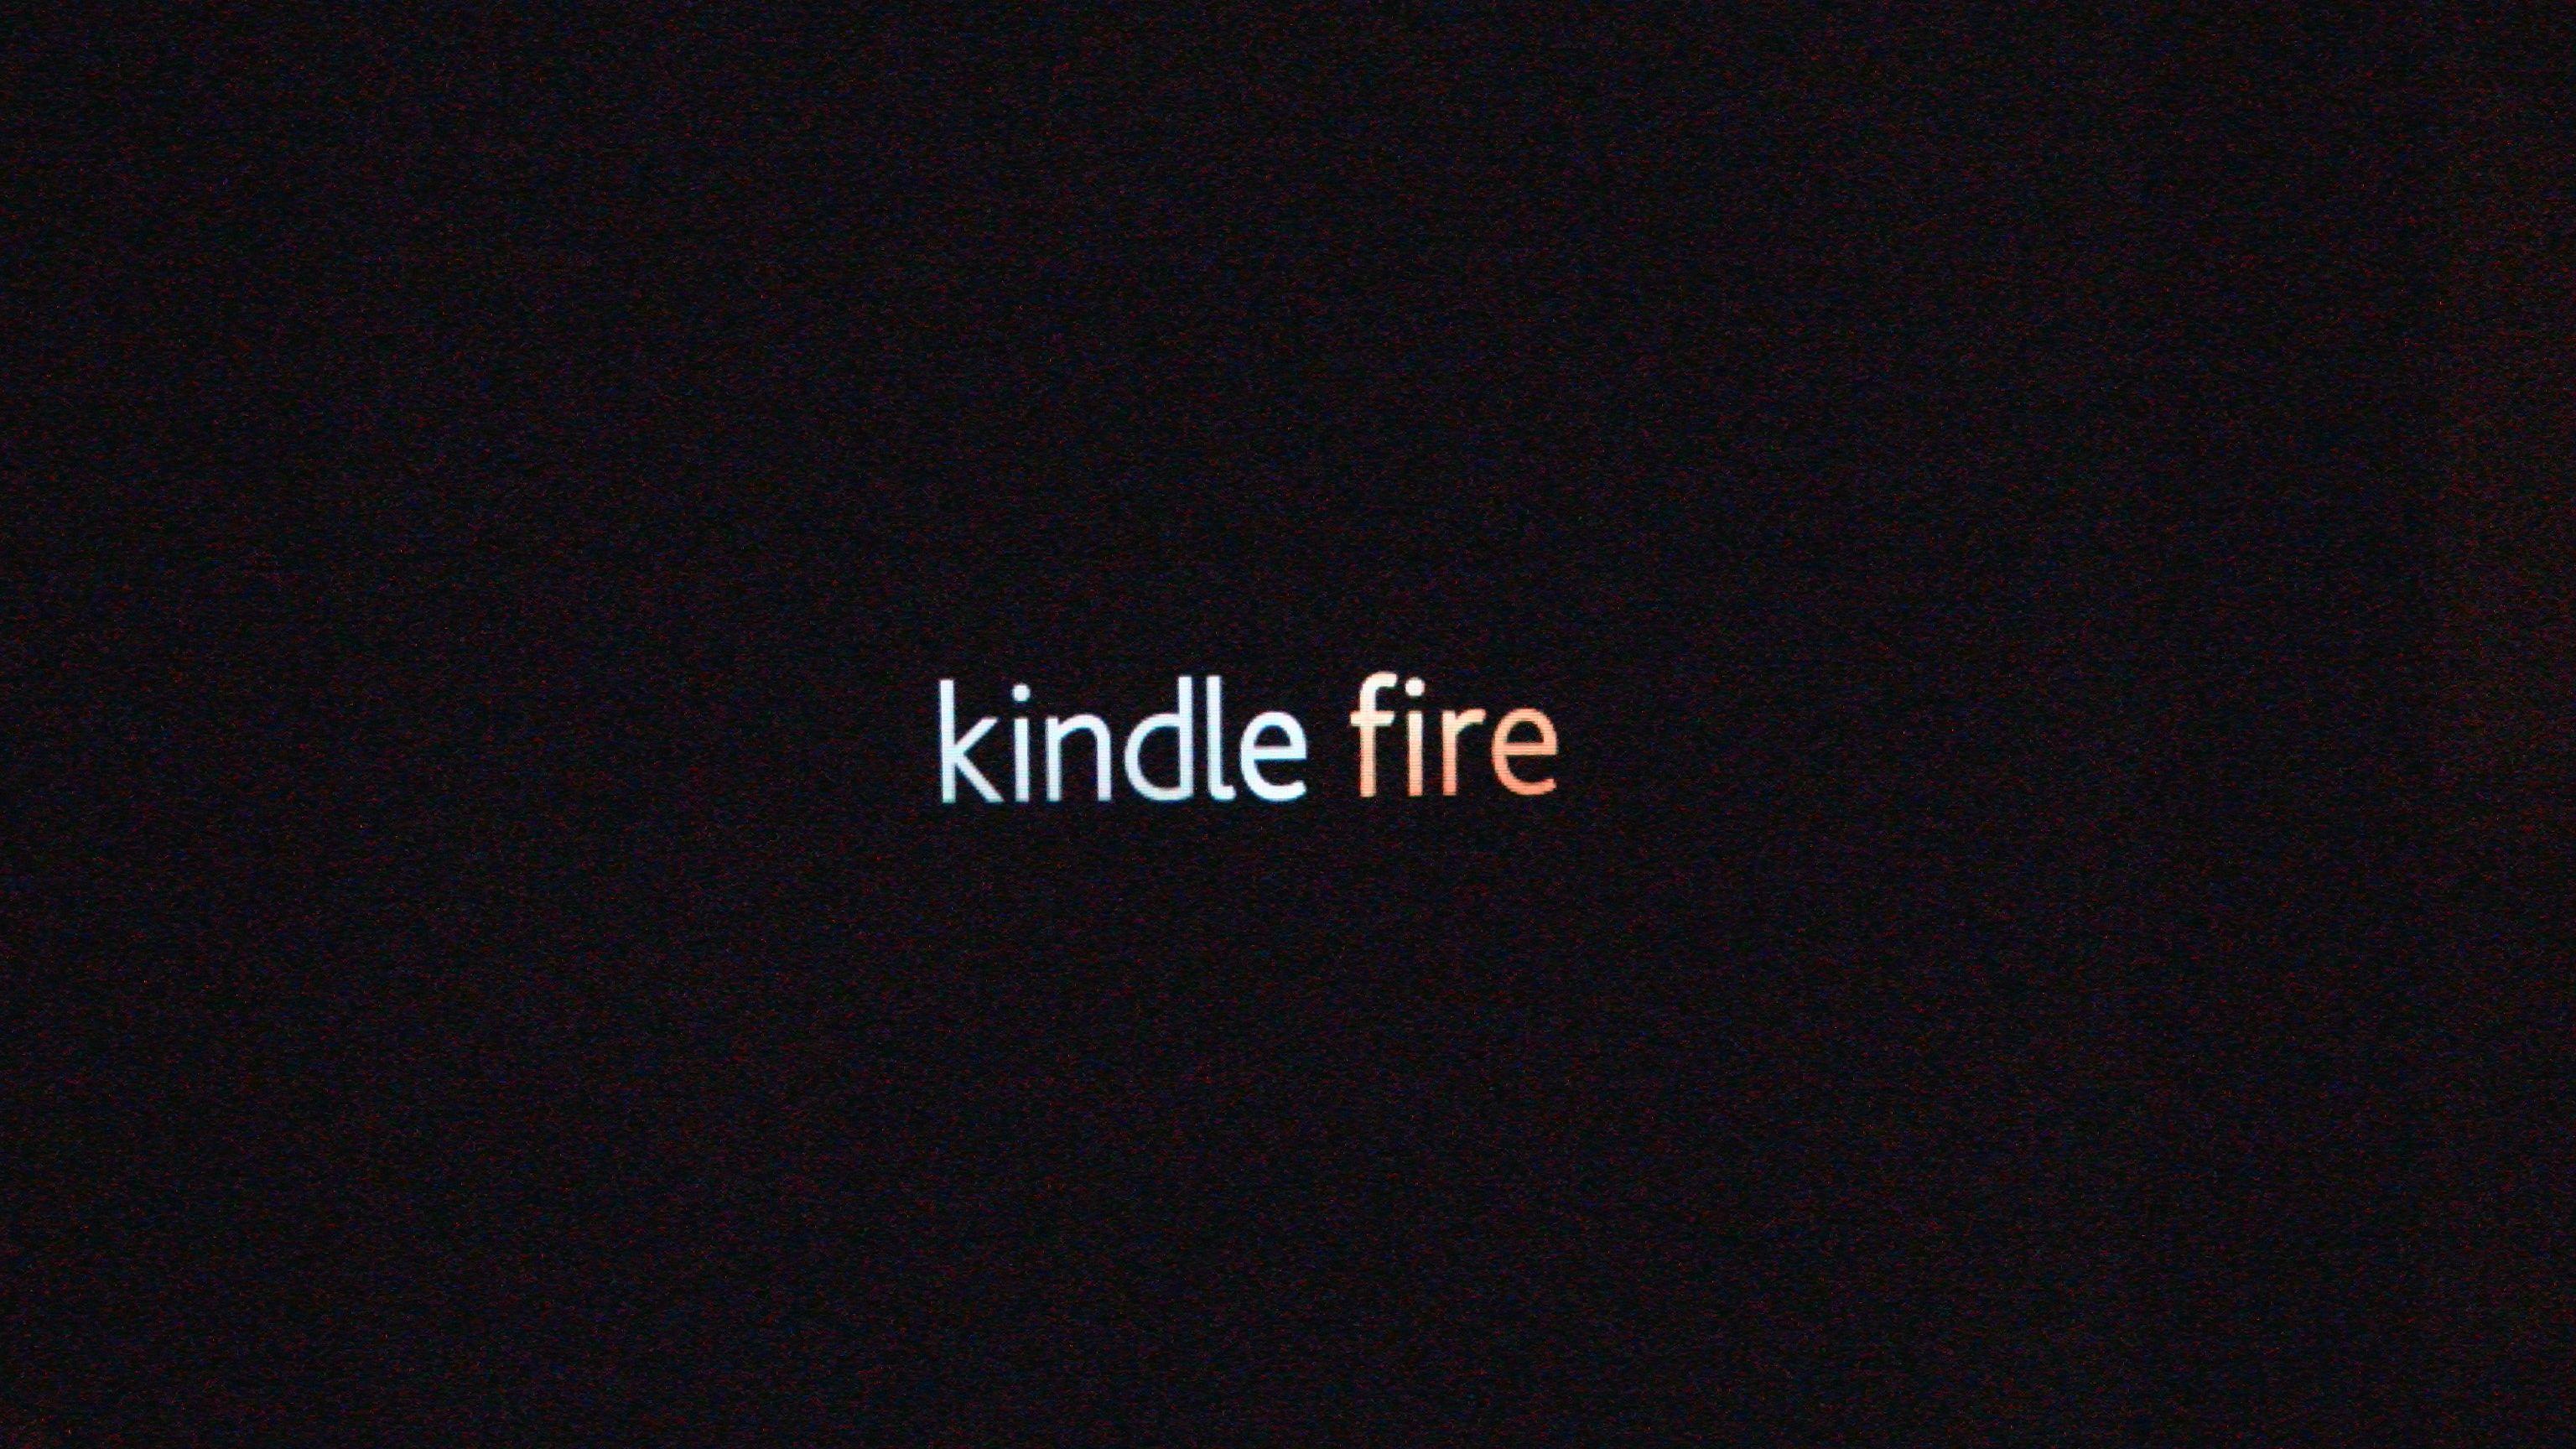 50 Amazon Fire 7 Tablet Wallpaper On Wallpapersafari